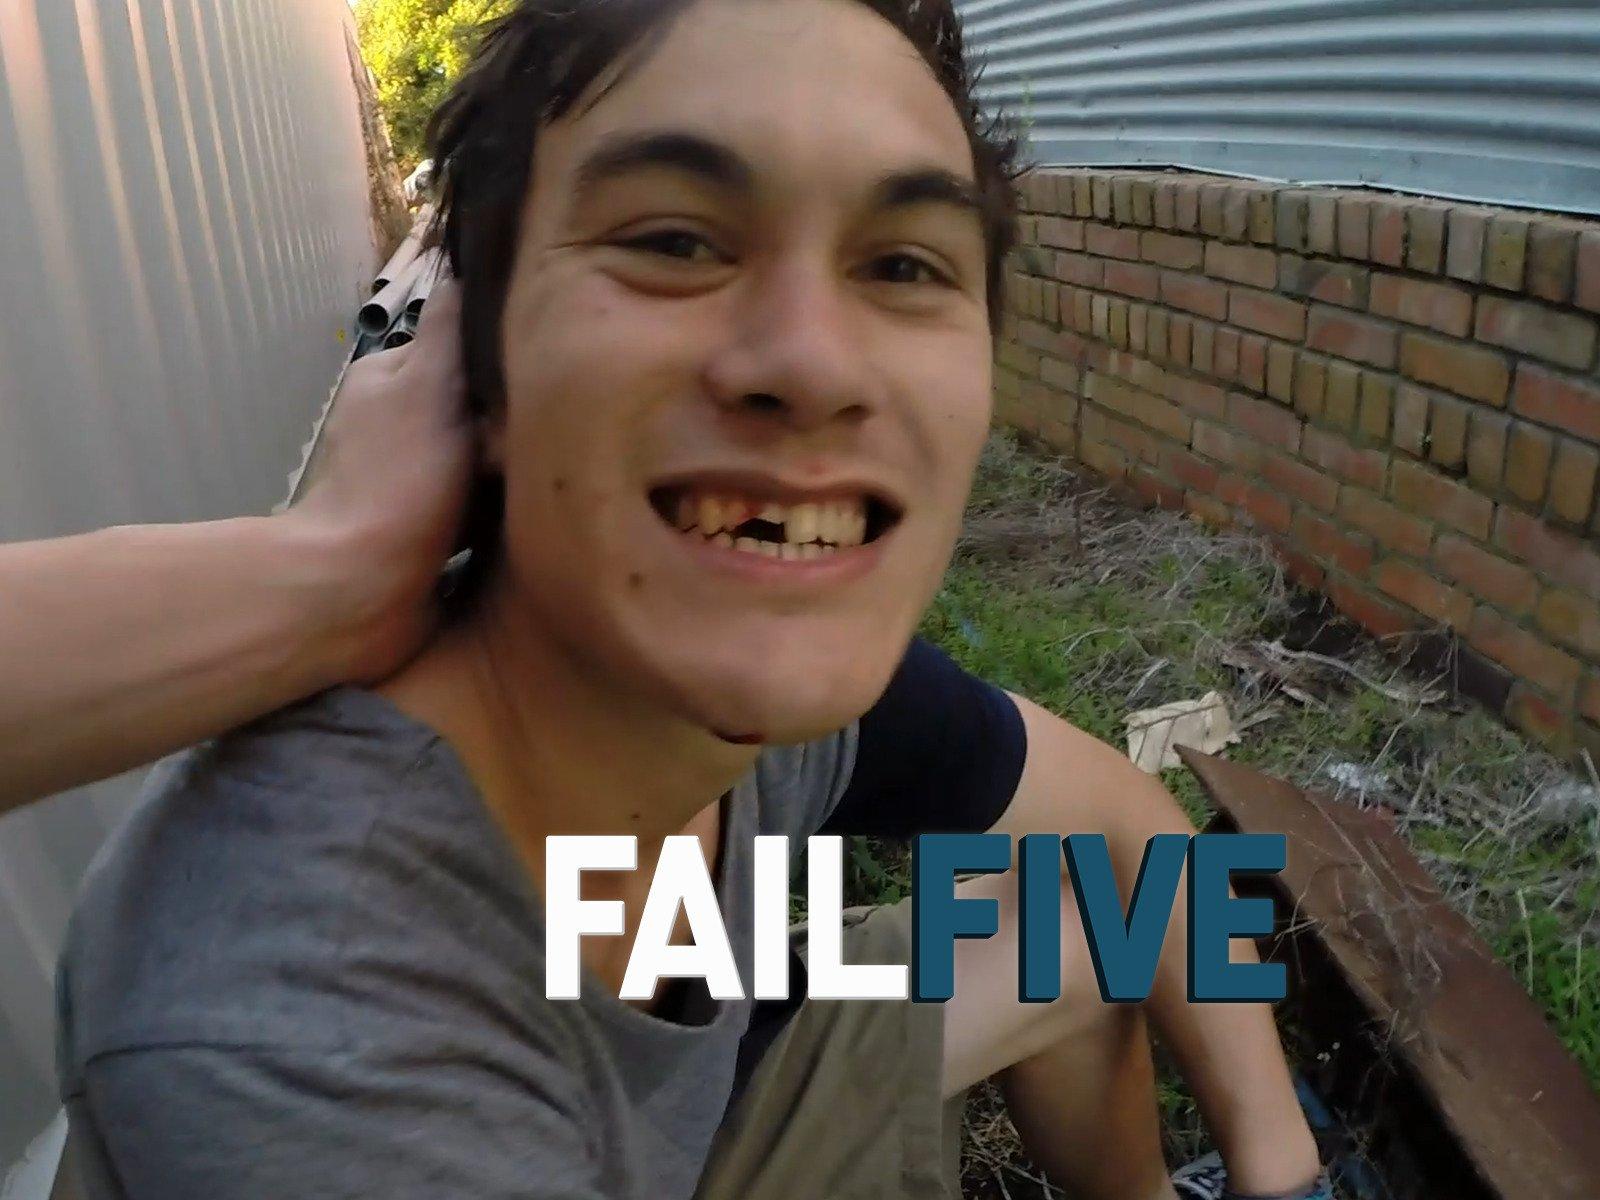 Clip: FailFive - Season 1